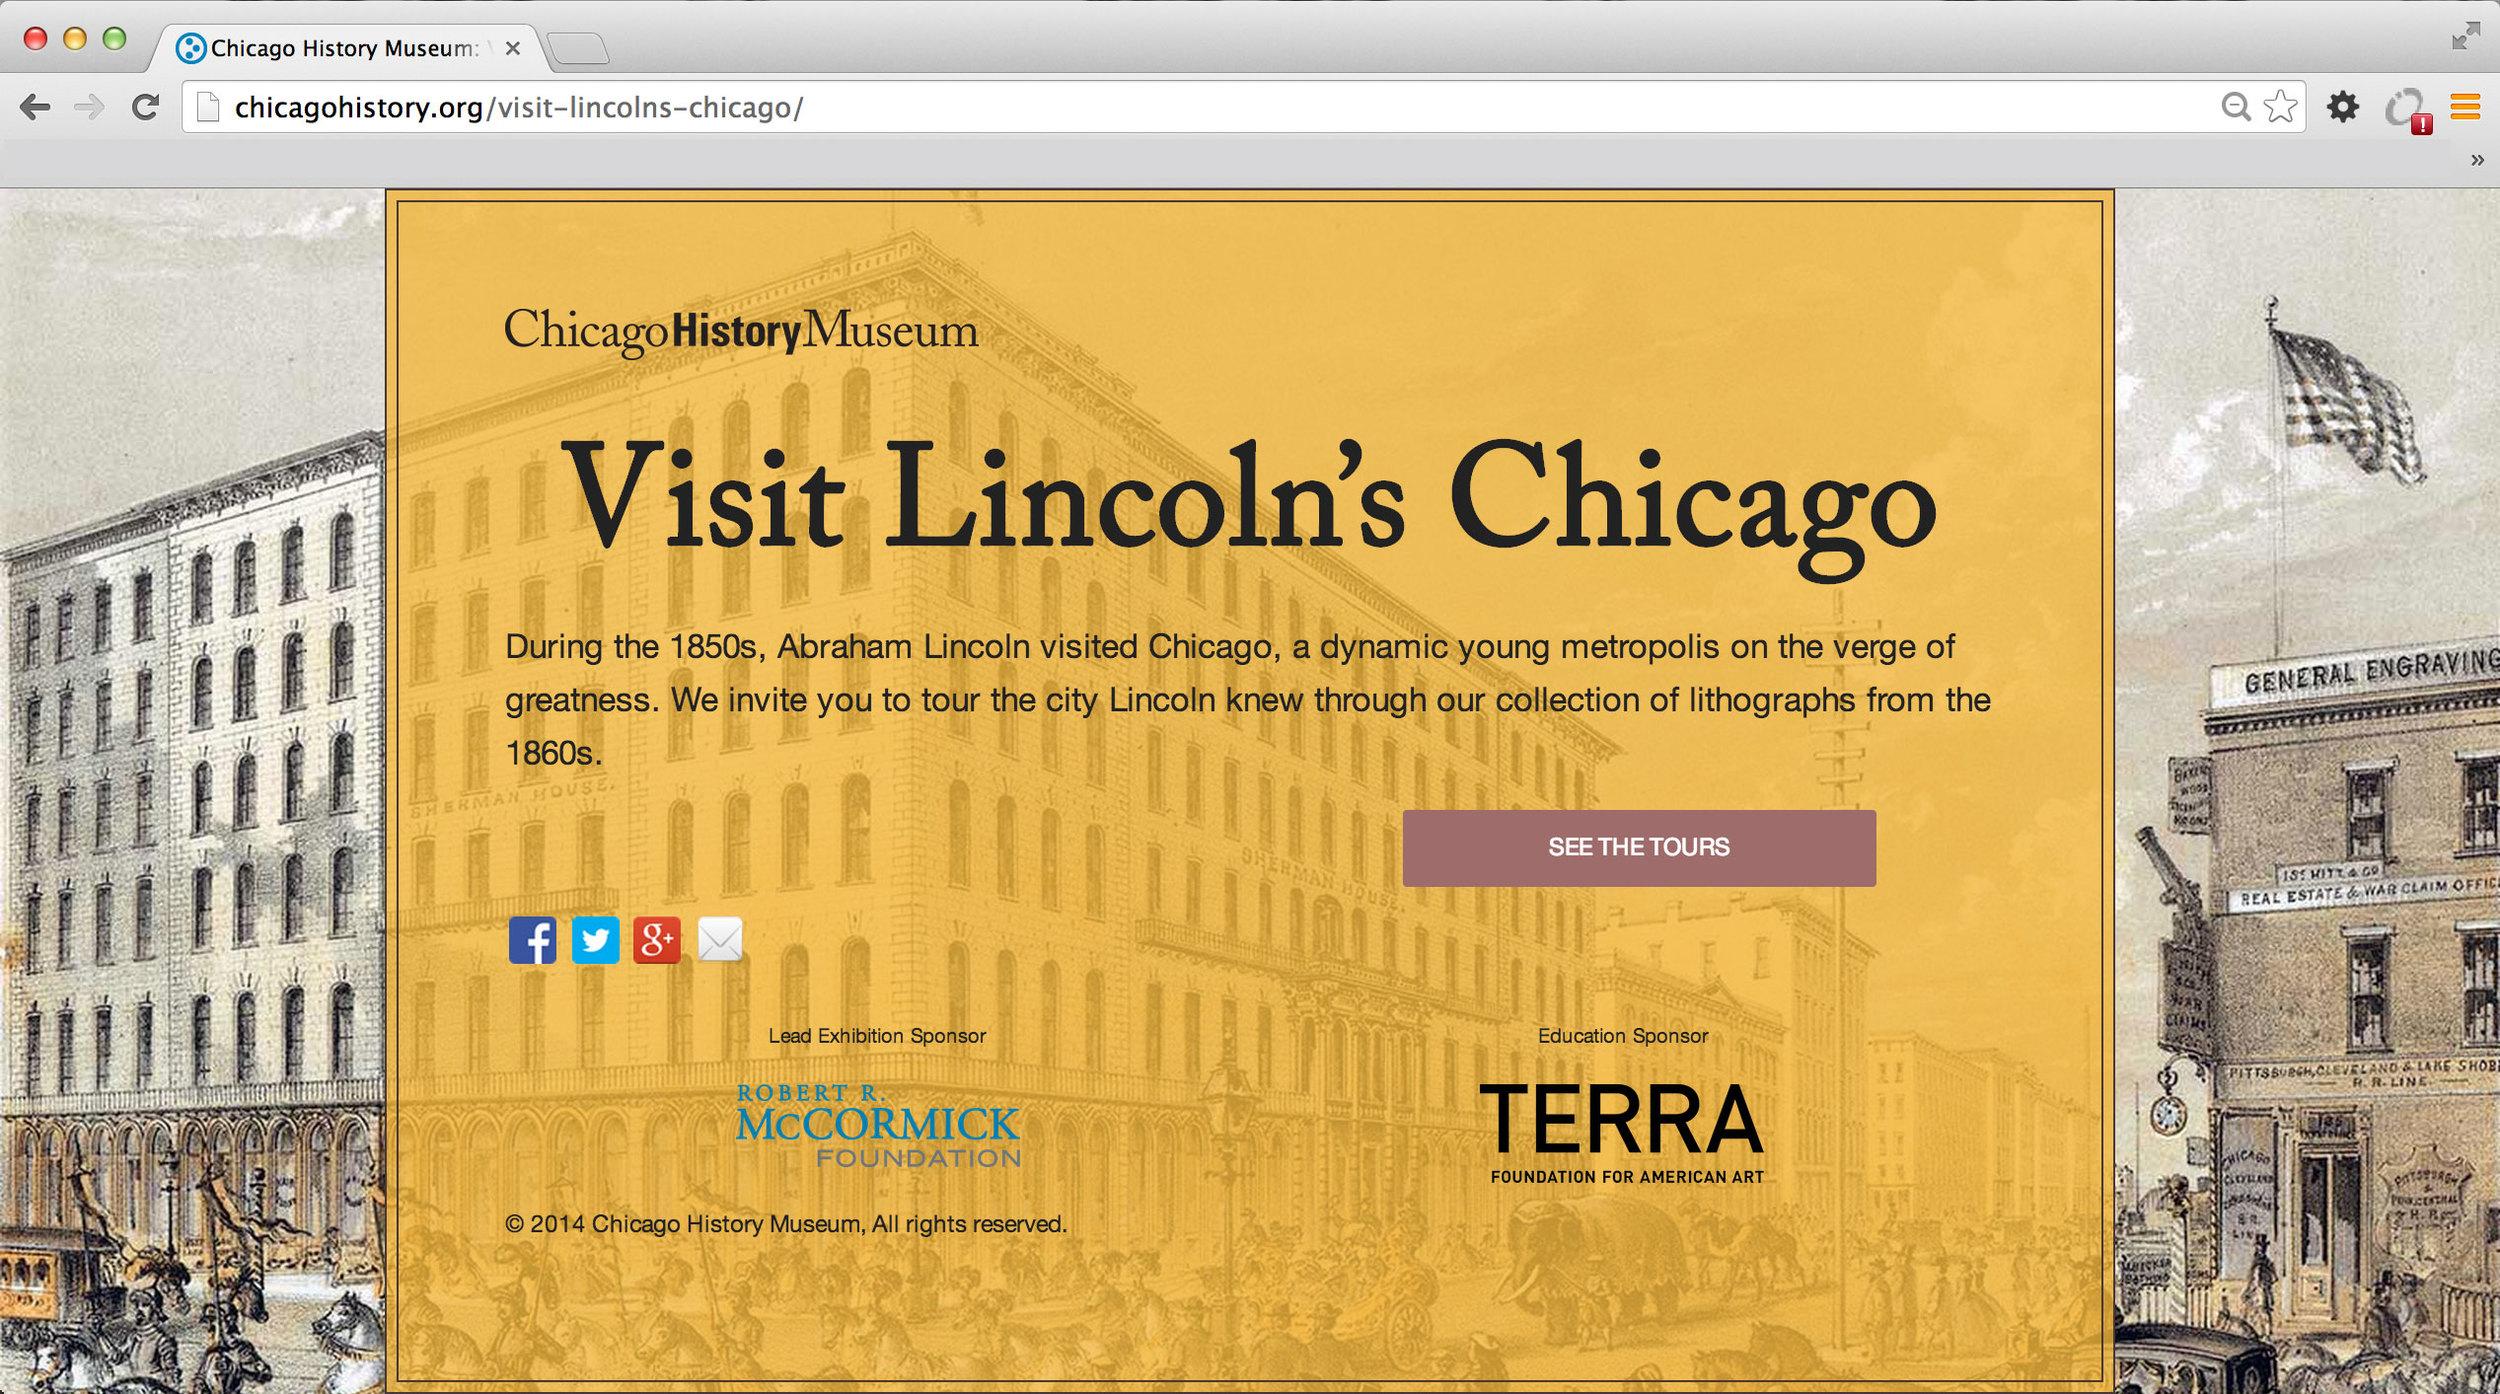 visit-lincolns-chicago-website